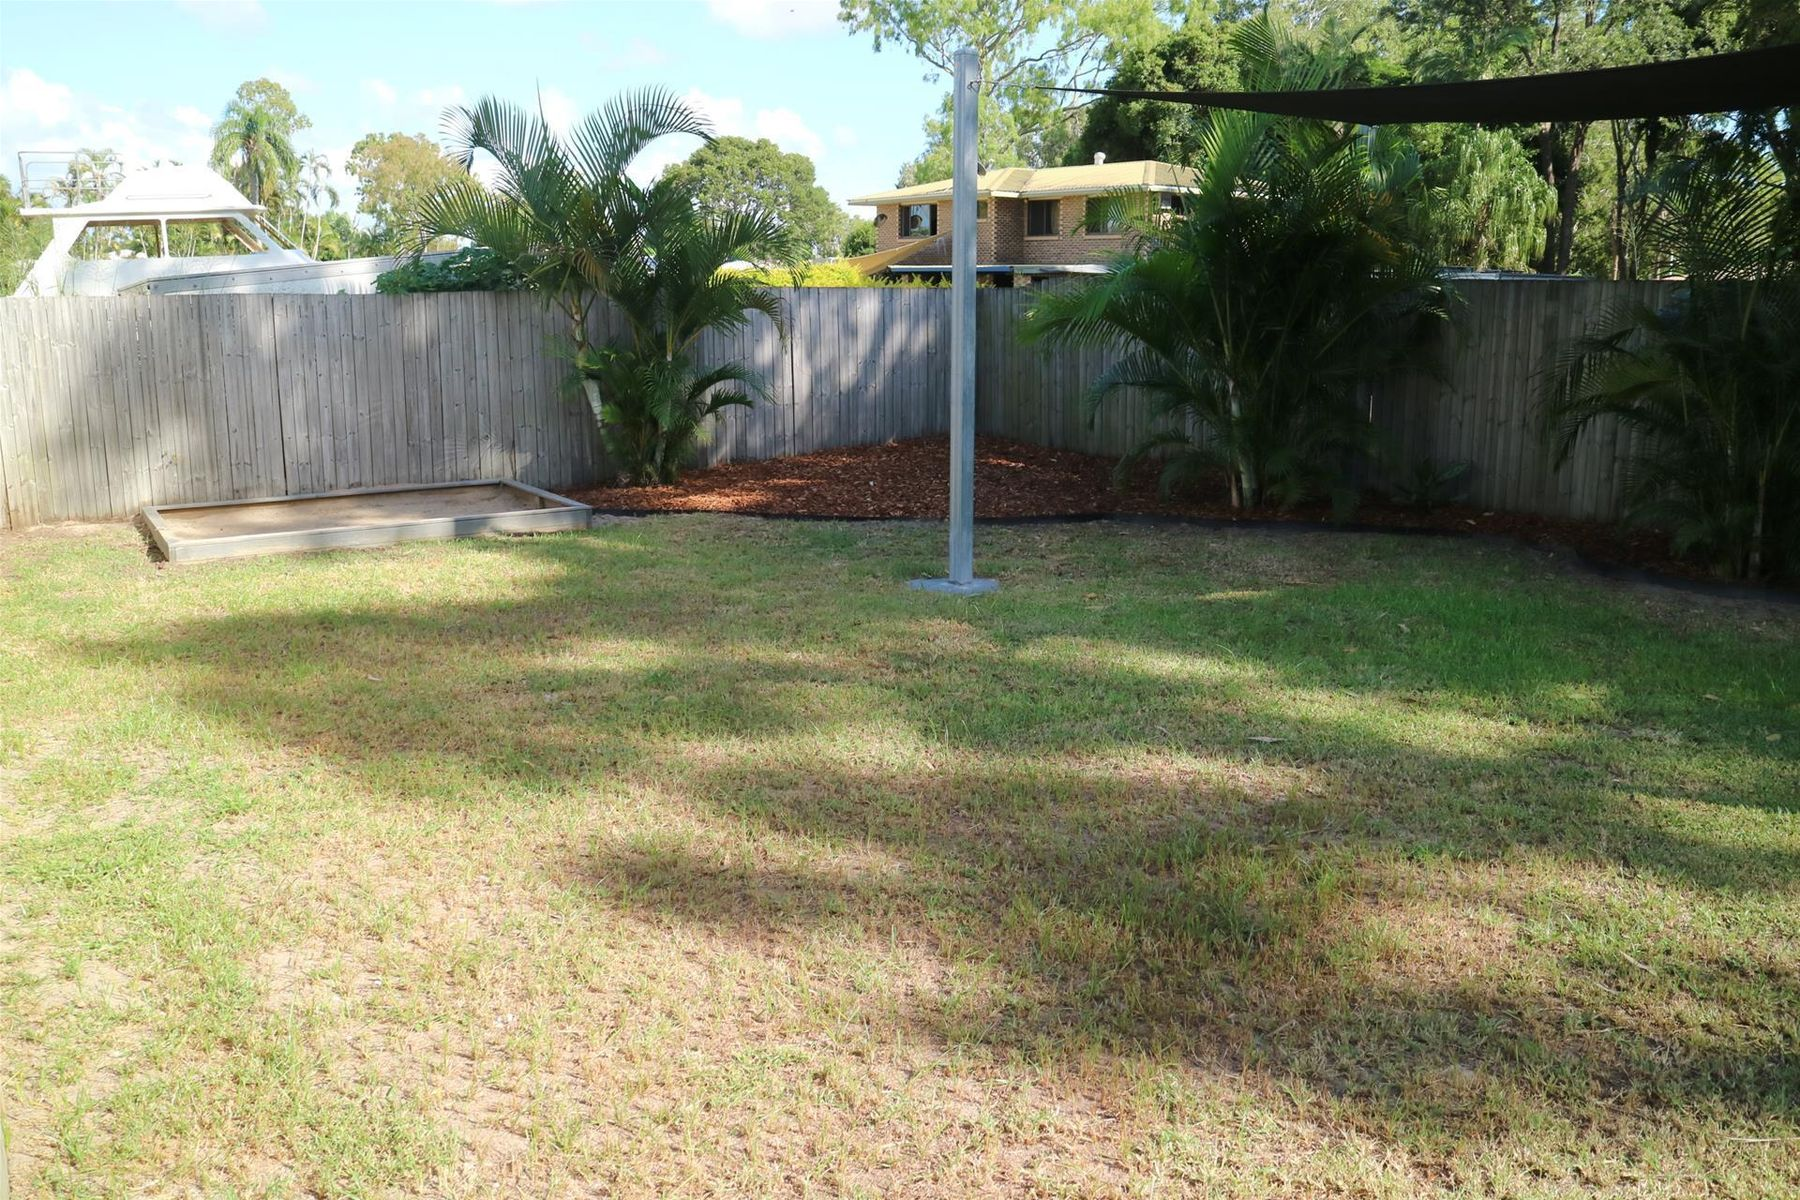 43 Wattle Street, Andergrove, QLD 4740